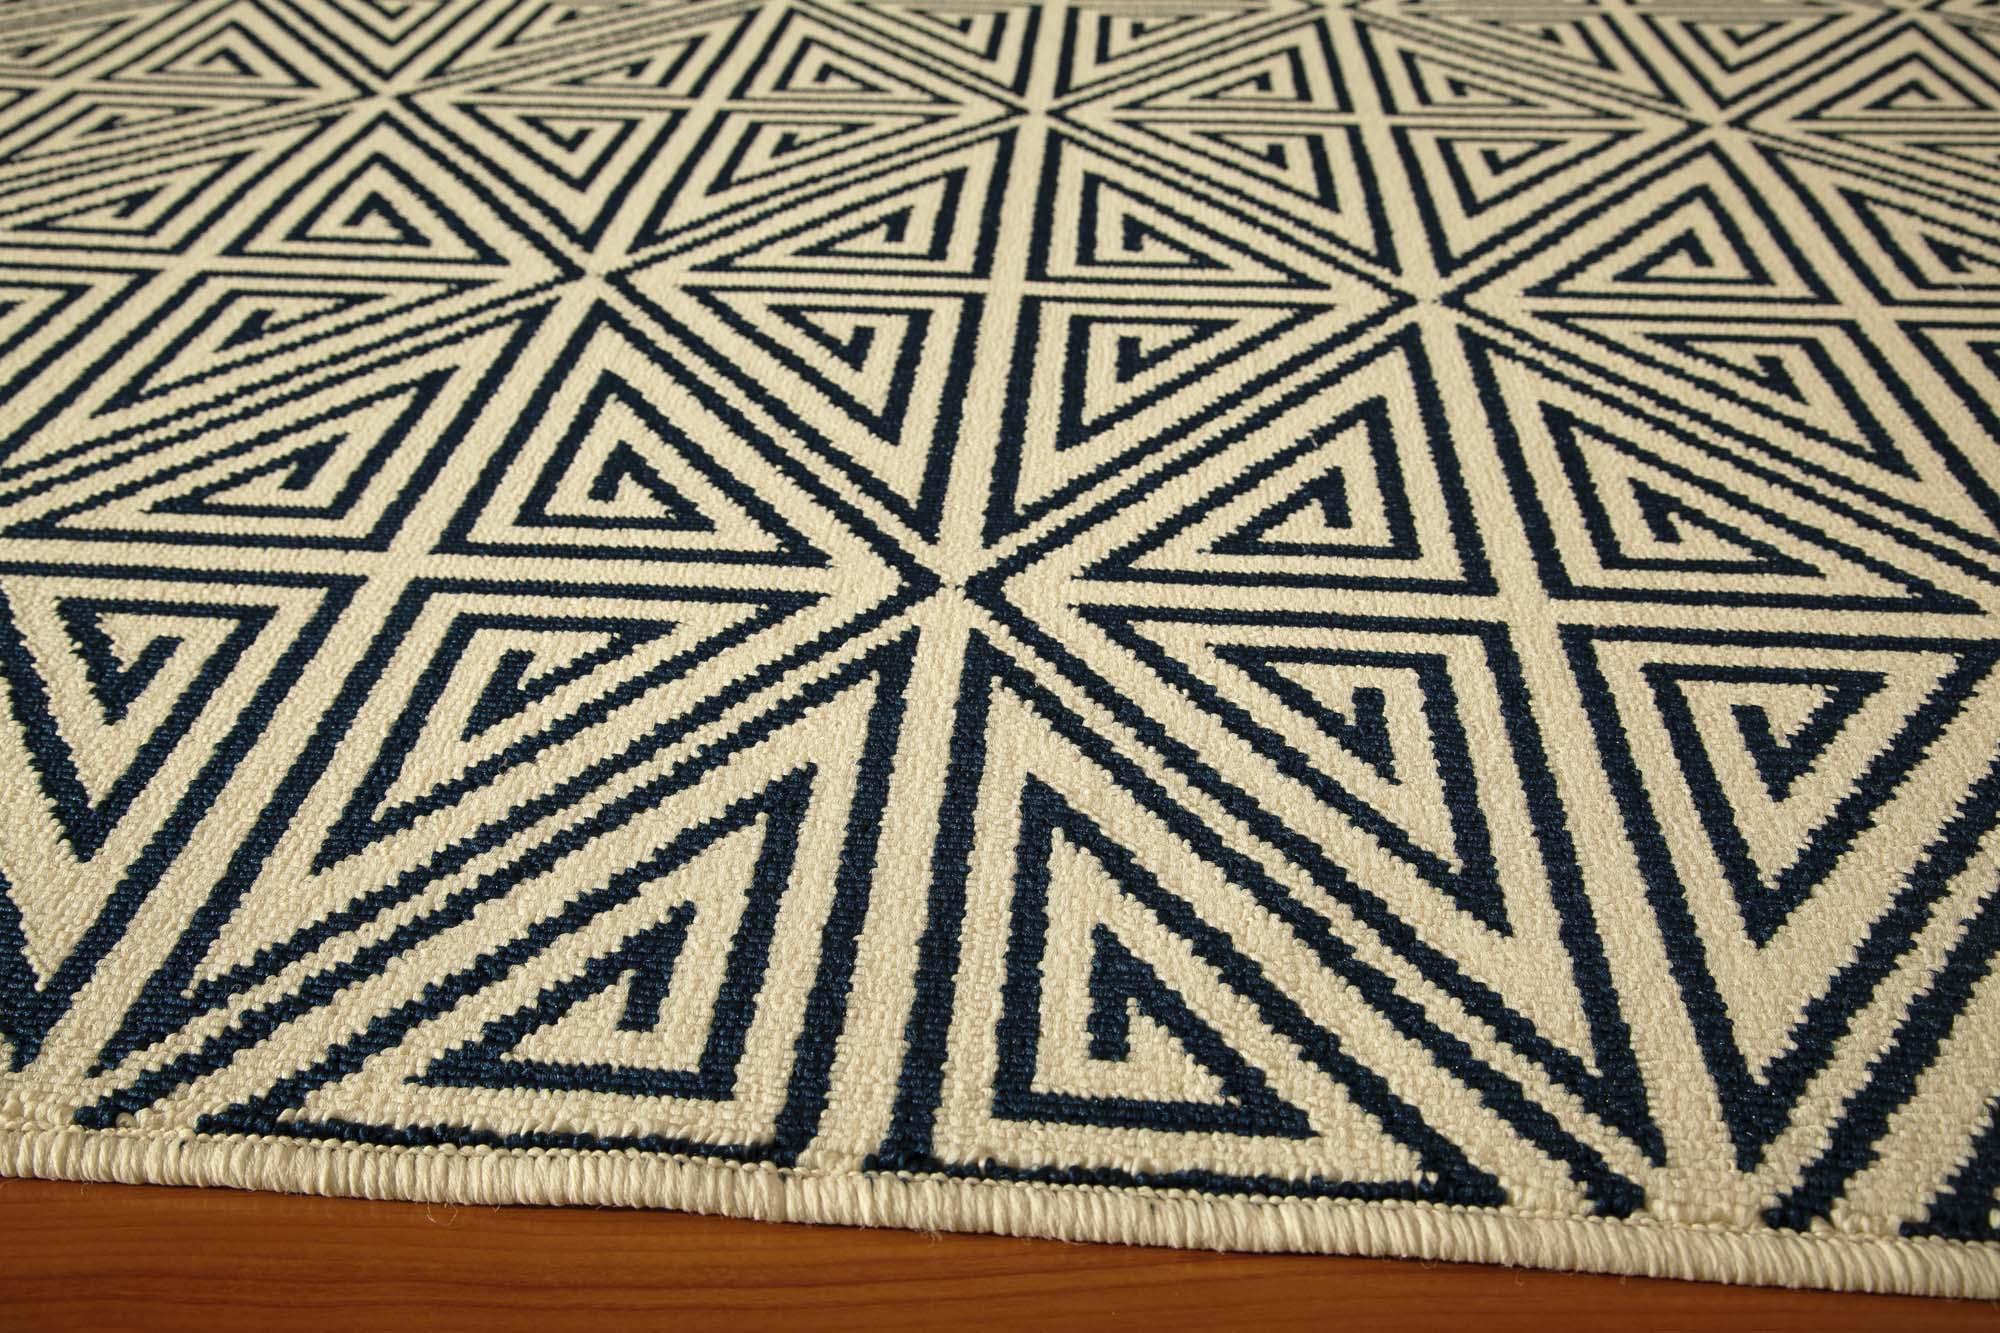 Elegant Momeni Baja Baj4 Navy Rug Indoor/outdoor Rugs - Home Brands USA momeni outdoor rugs